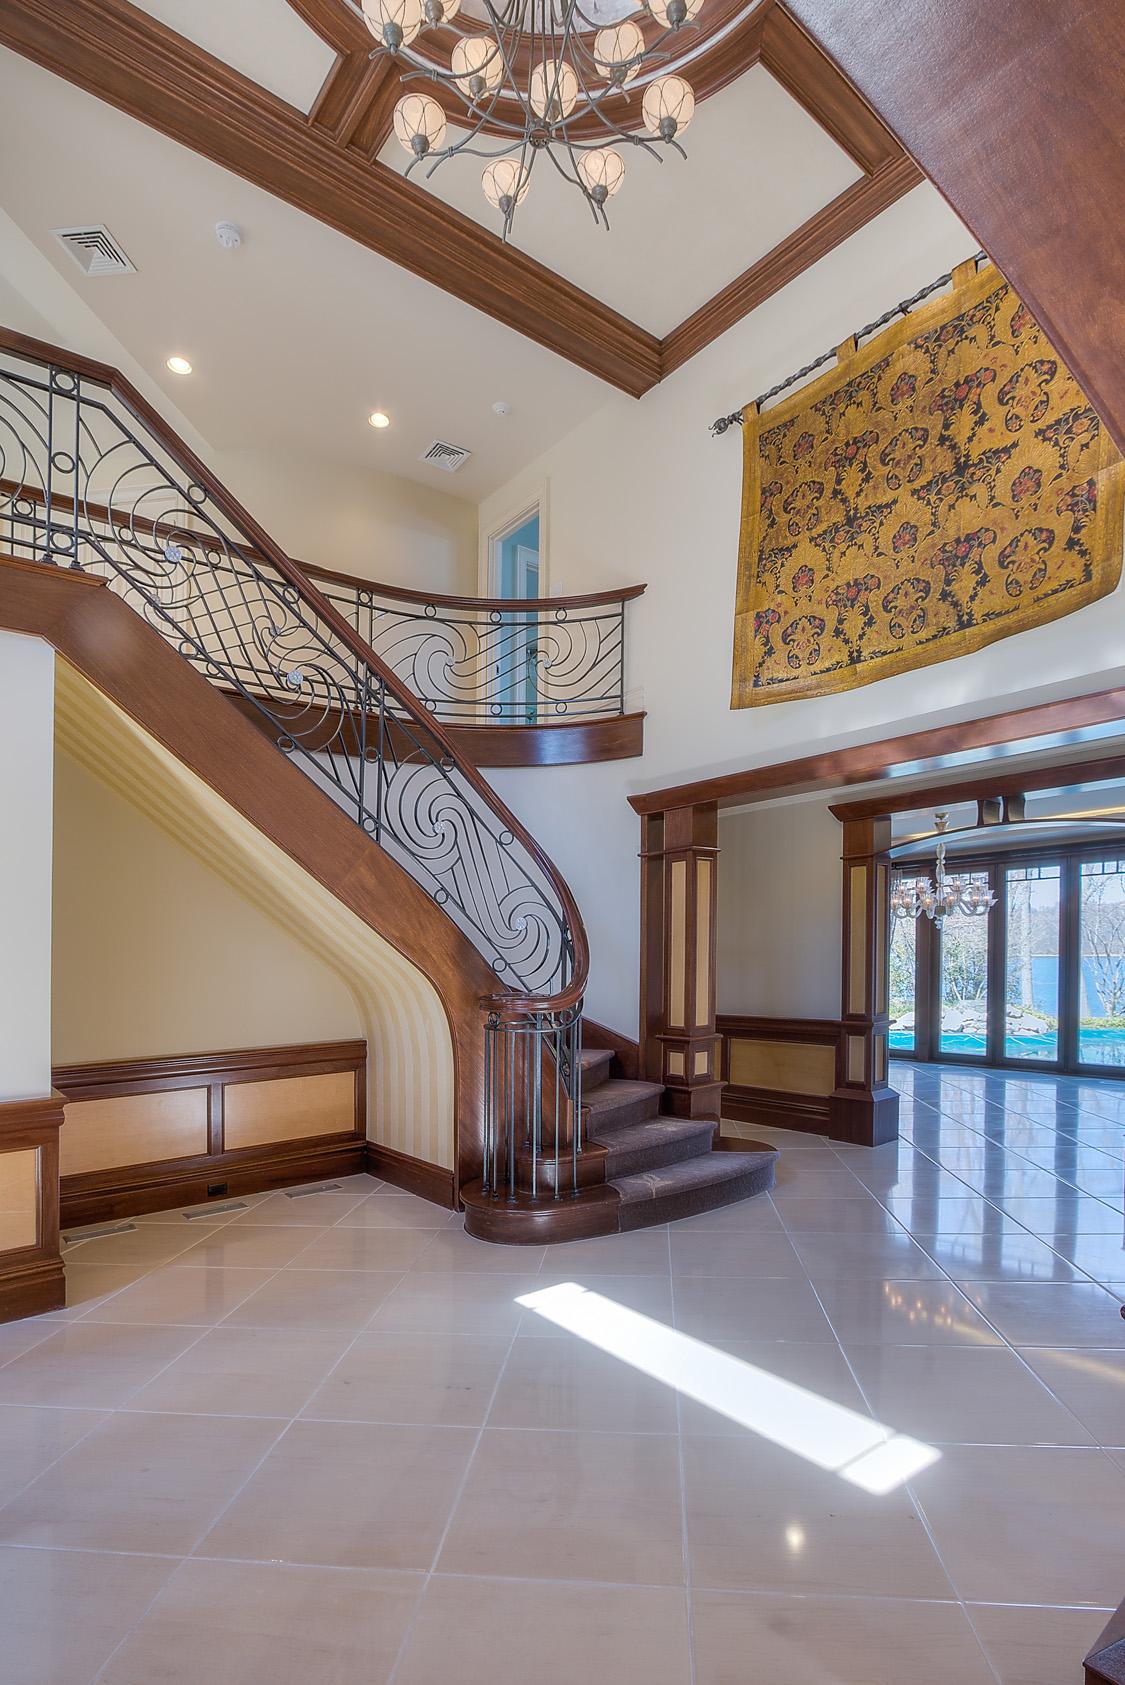 Single Family Home for Sale at Post Modern 52 School Ln Lloyd Harbor, New York, 11743 United States